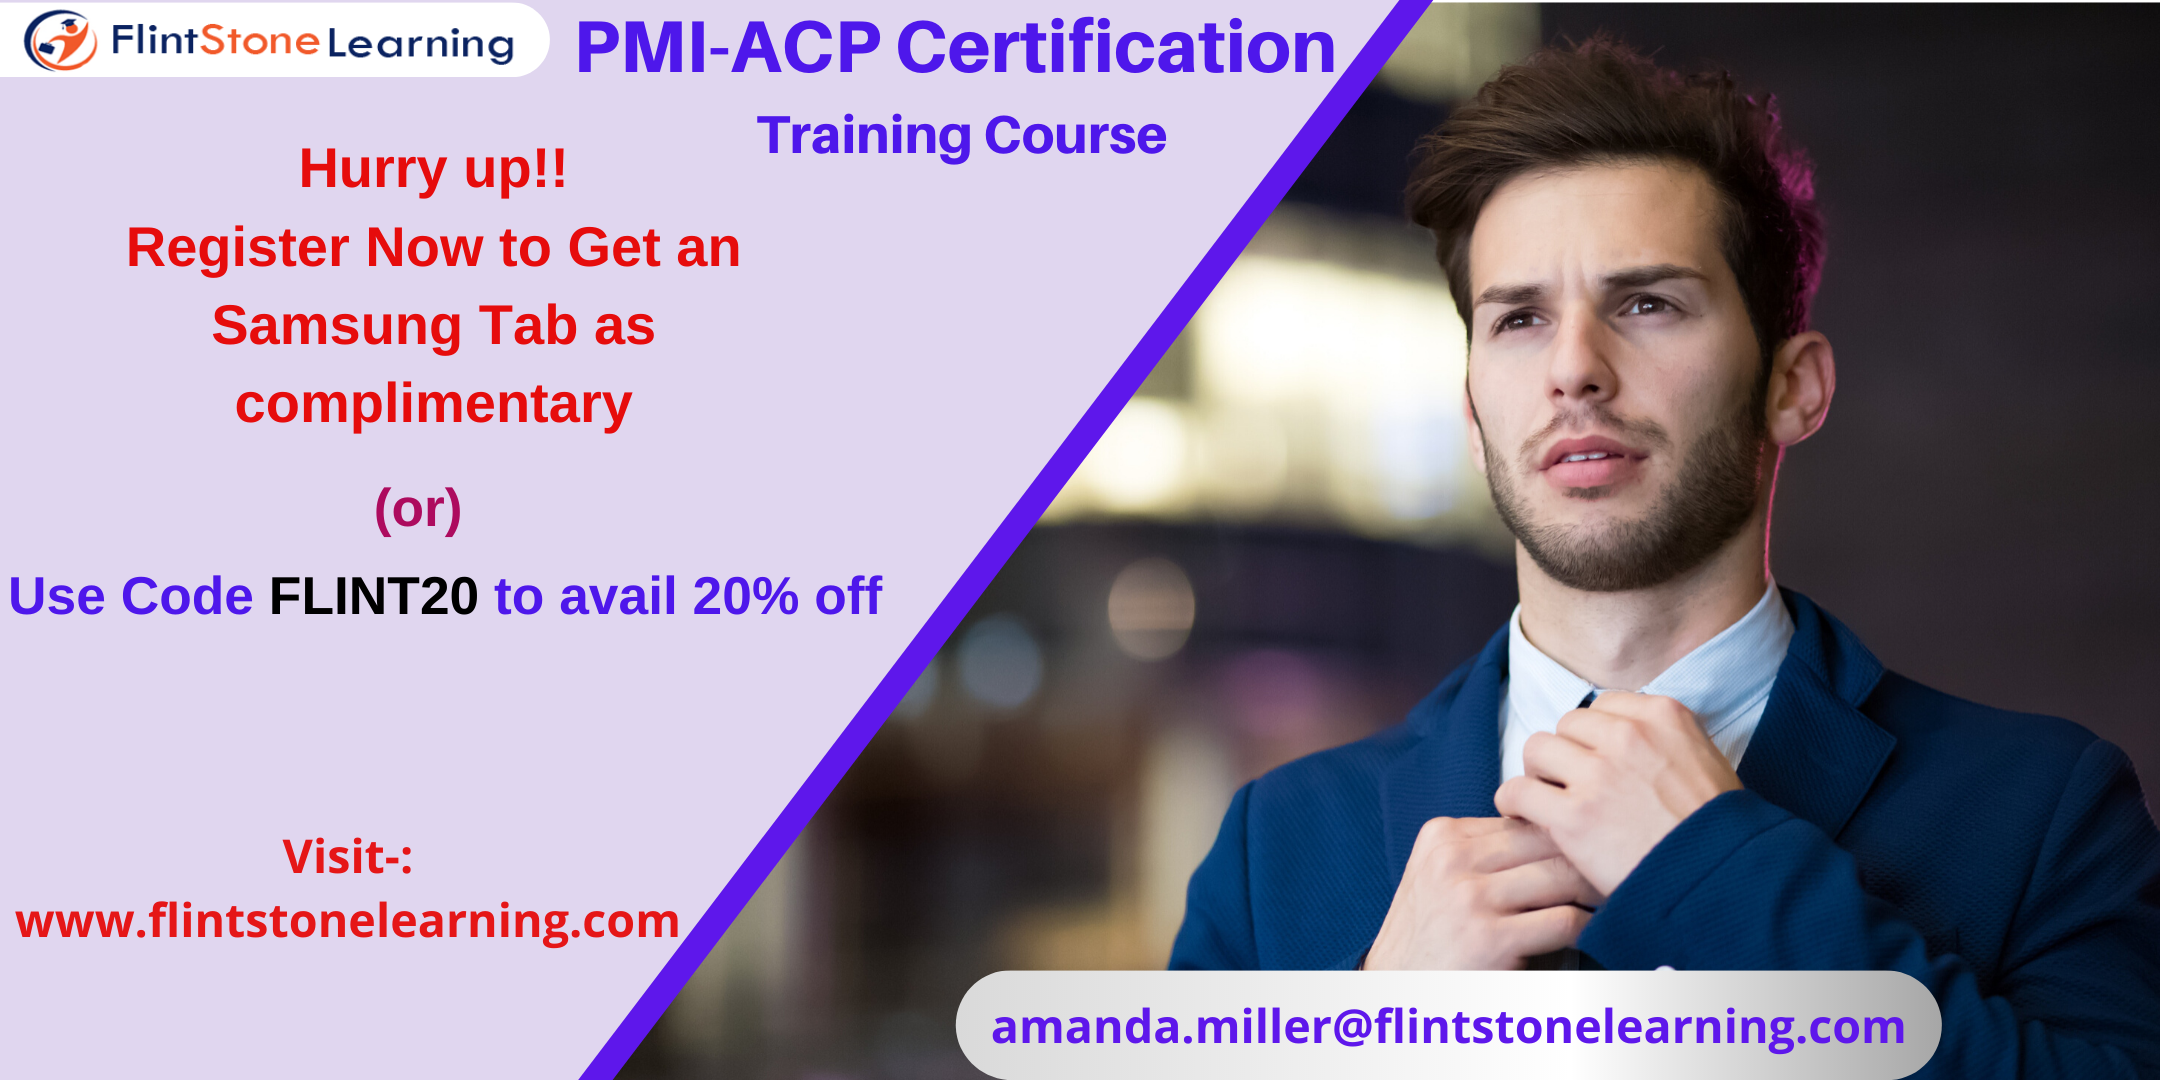 PMI-ACP Certification Training Course in Cranford, NJ